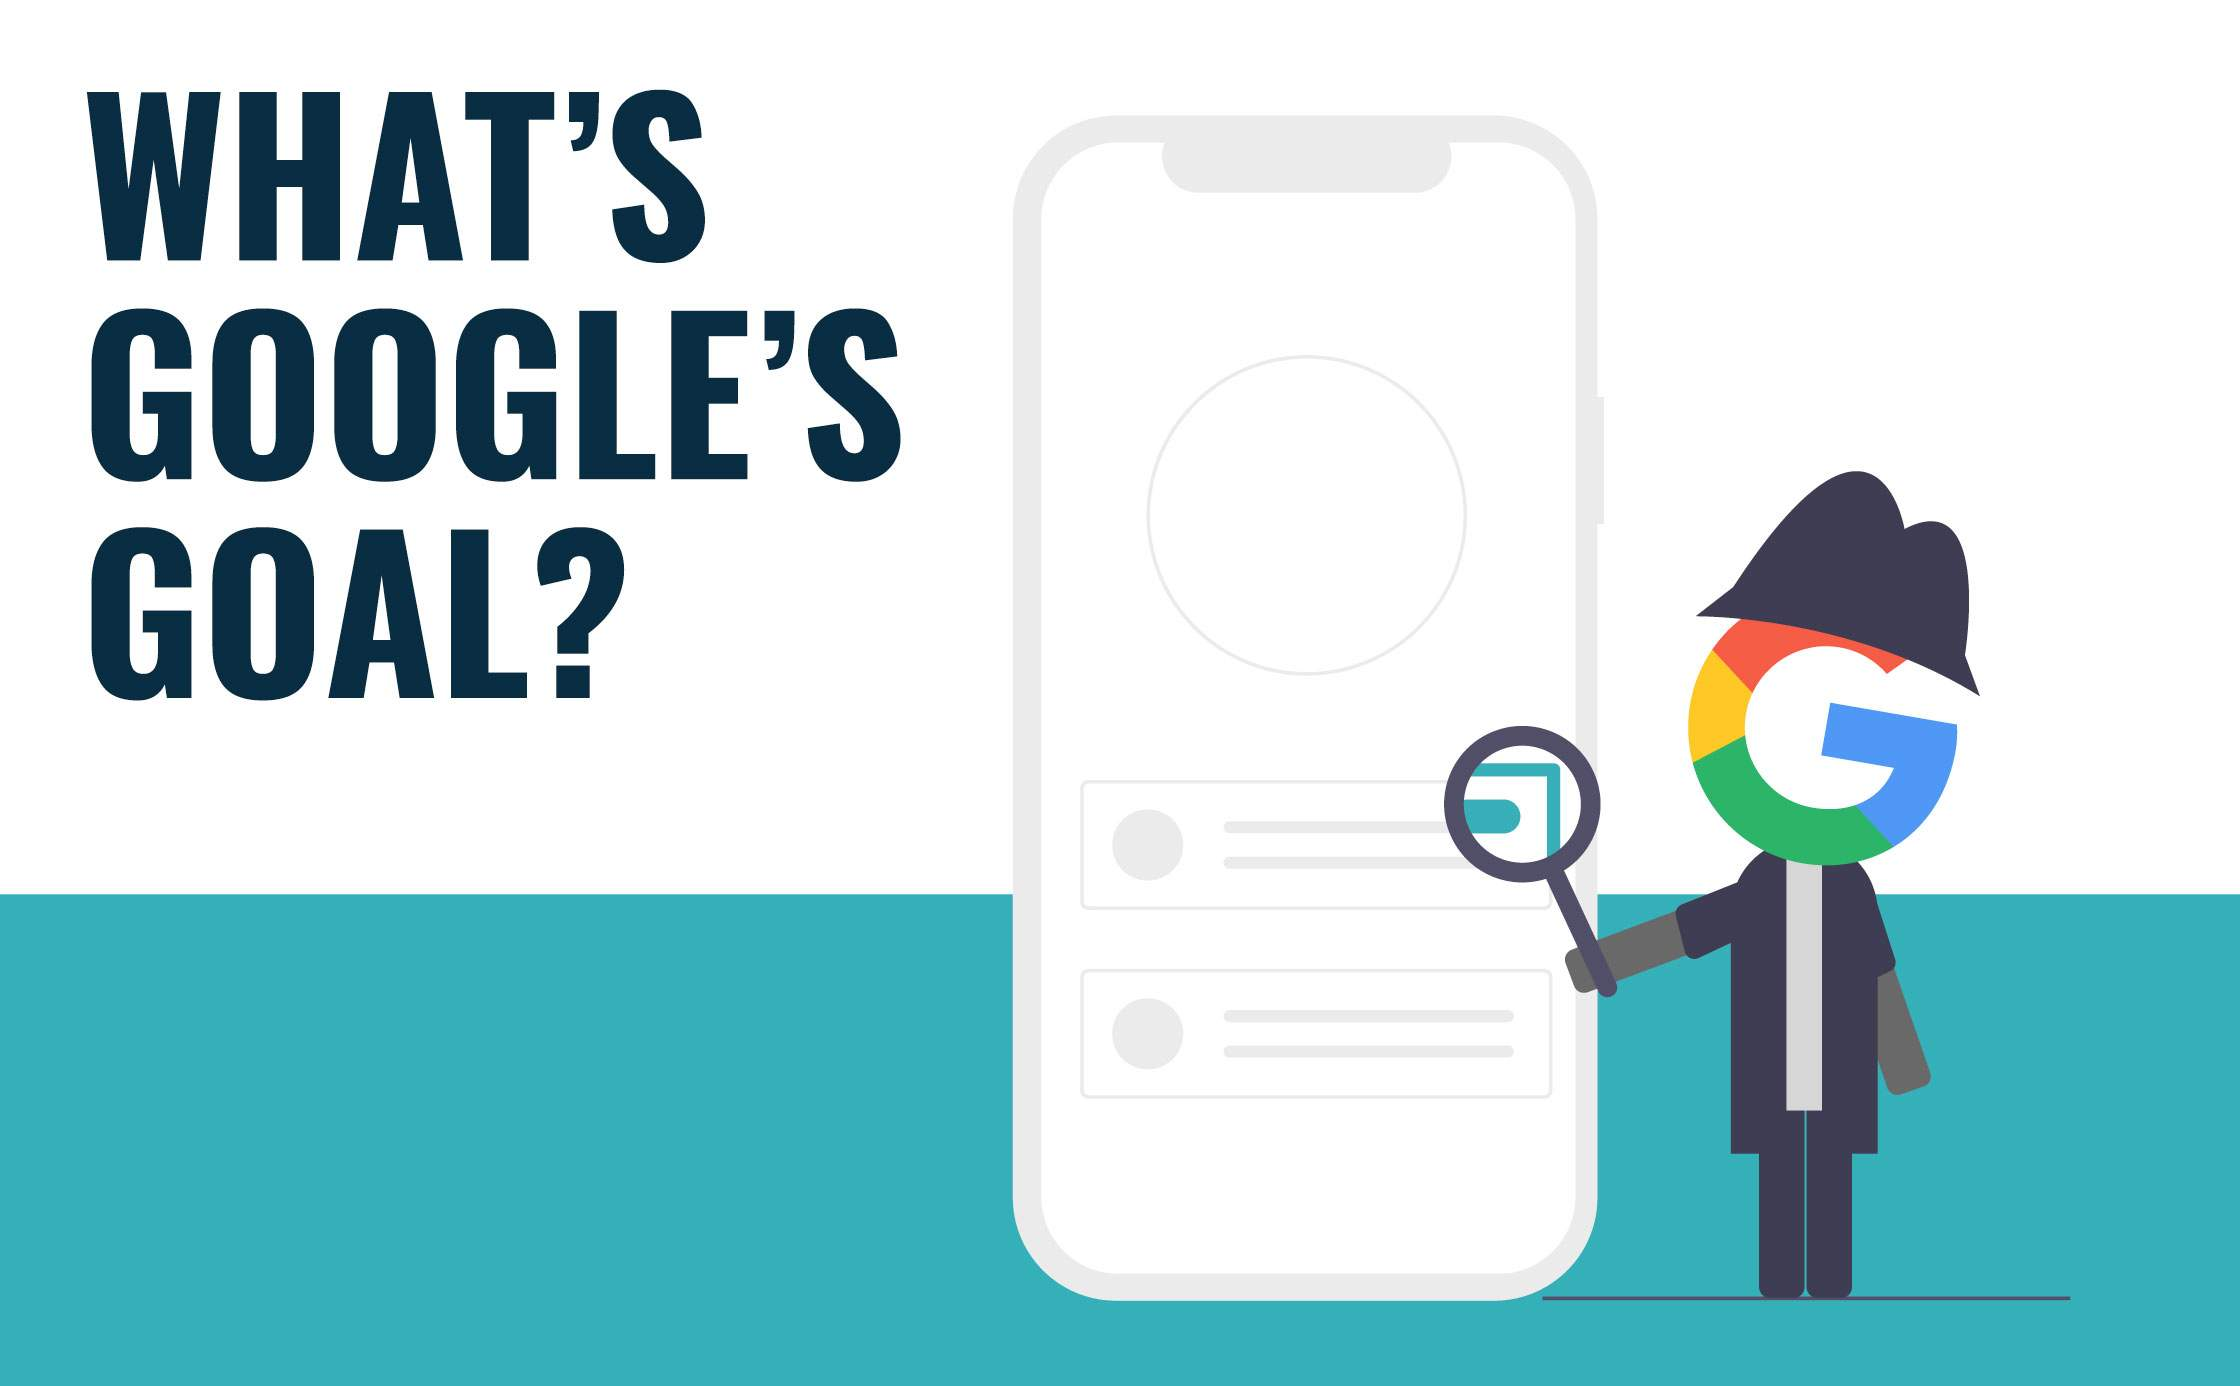 whats-googles-goal (1)